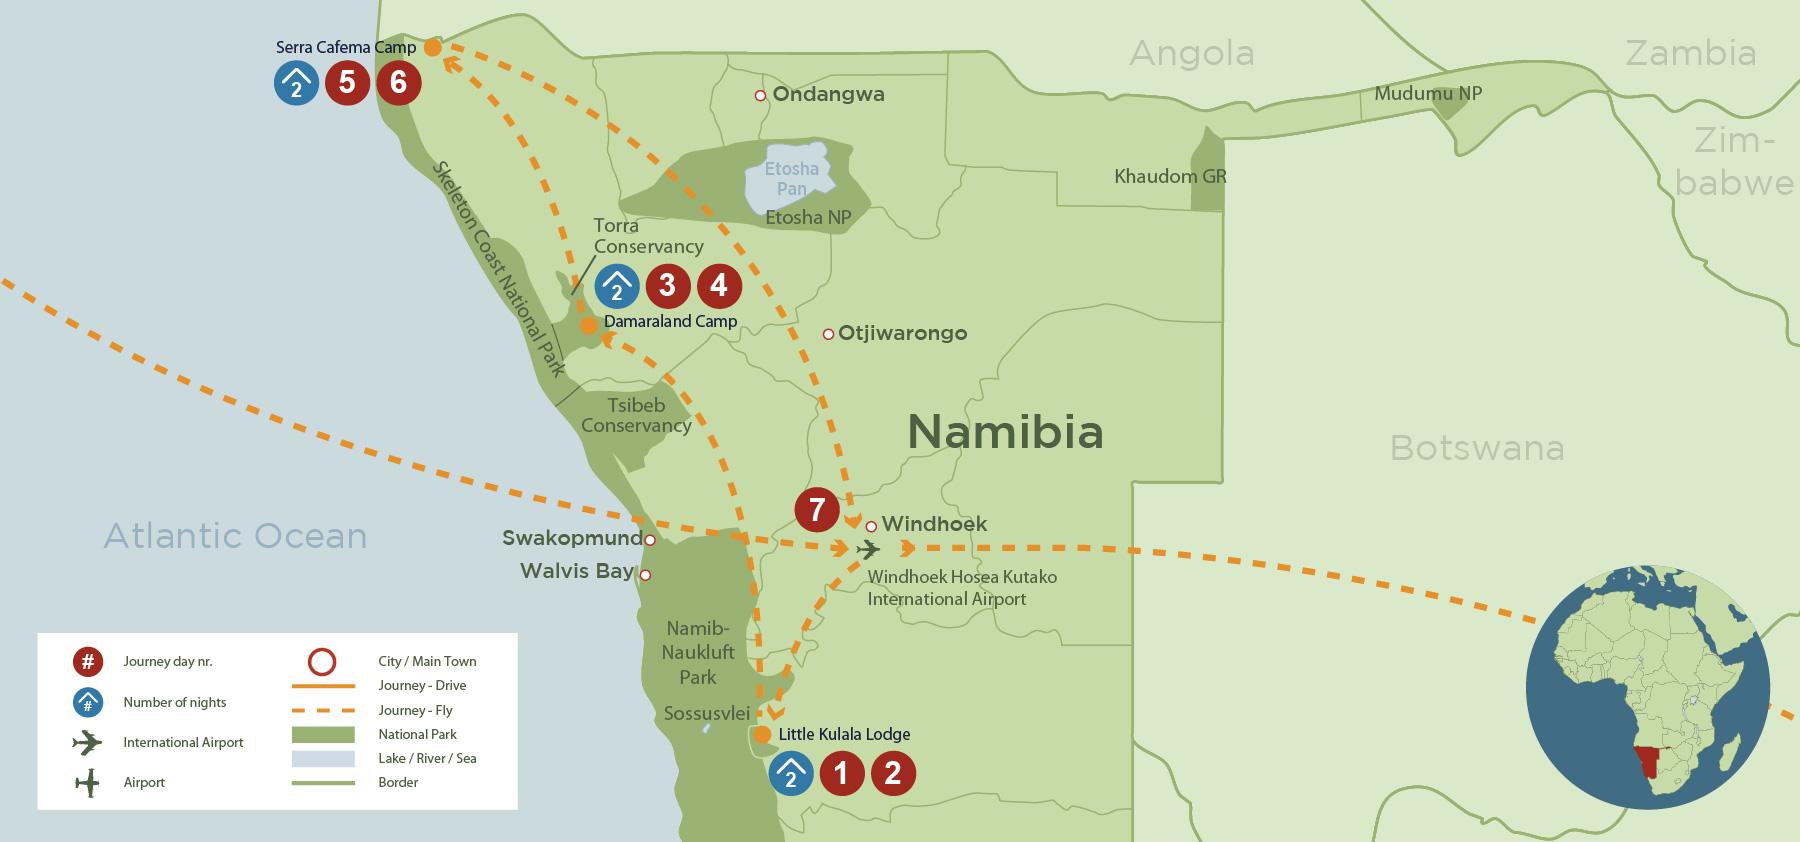 Luxury Namibia: Sossusvlei, Damaraland and Kunene (SA 7 days) safari map